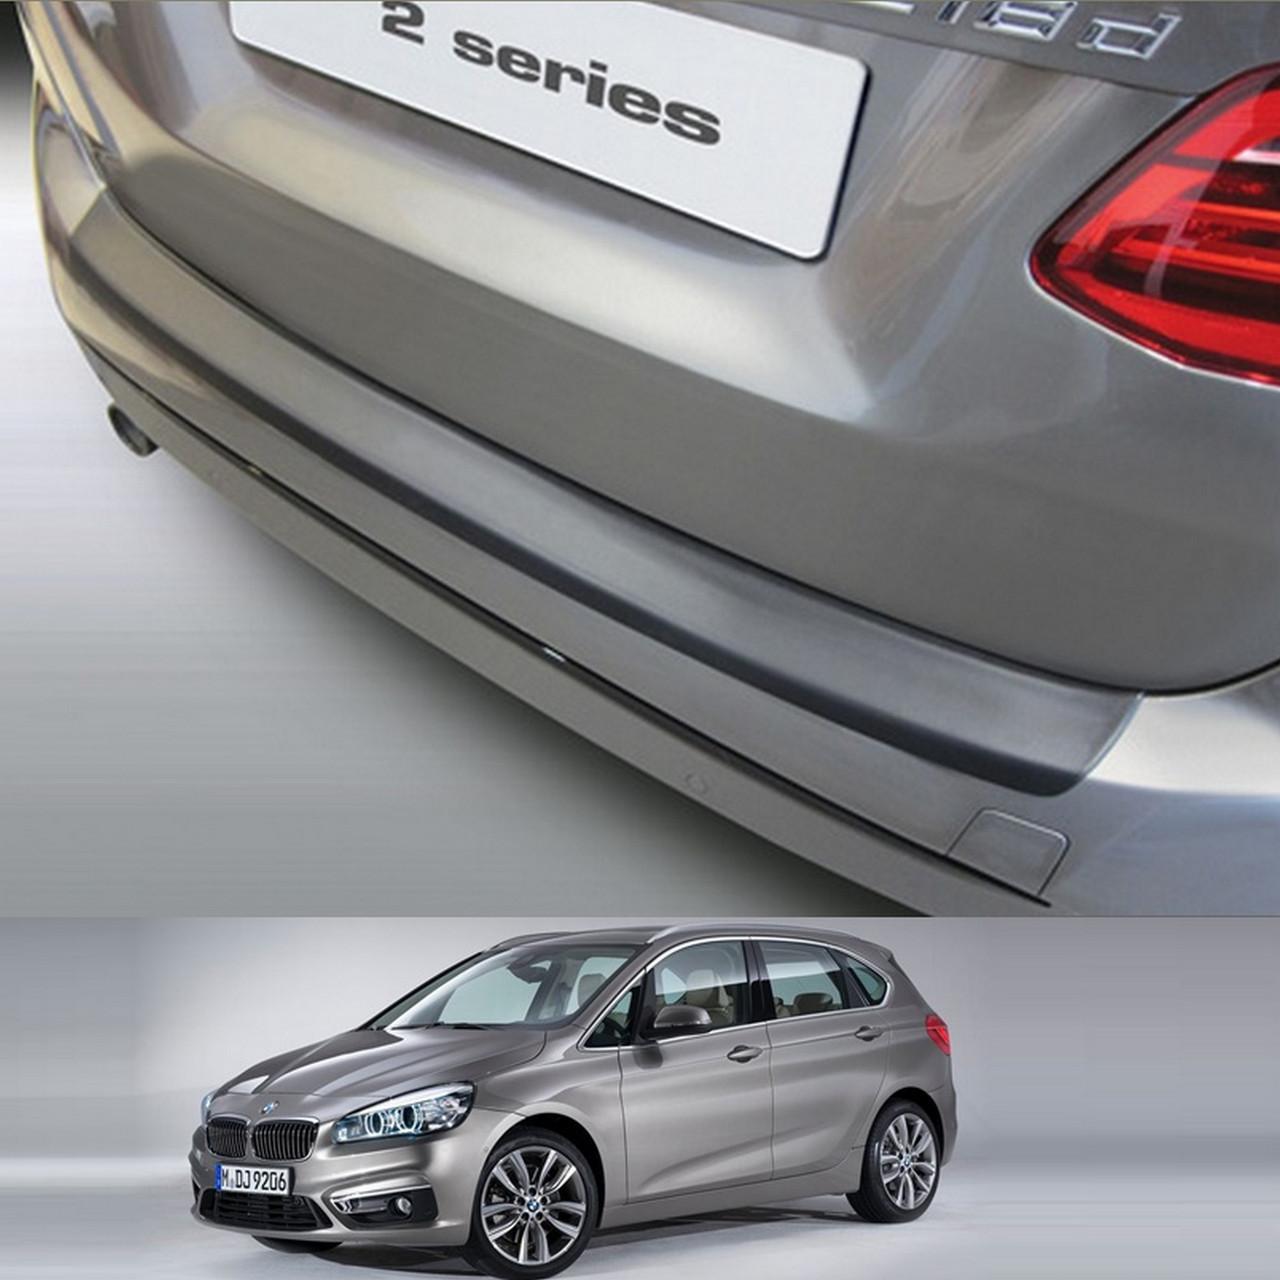 Пластиковая защитная накладка на задний бампер для BMW 2-series F45 Active Tourer 2014+ oem # 51472412724